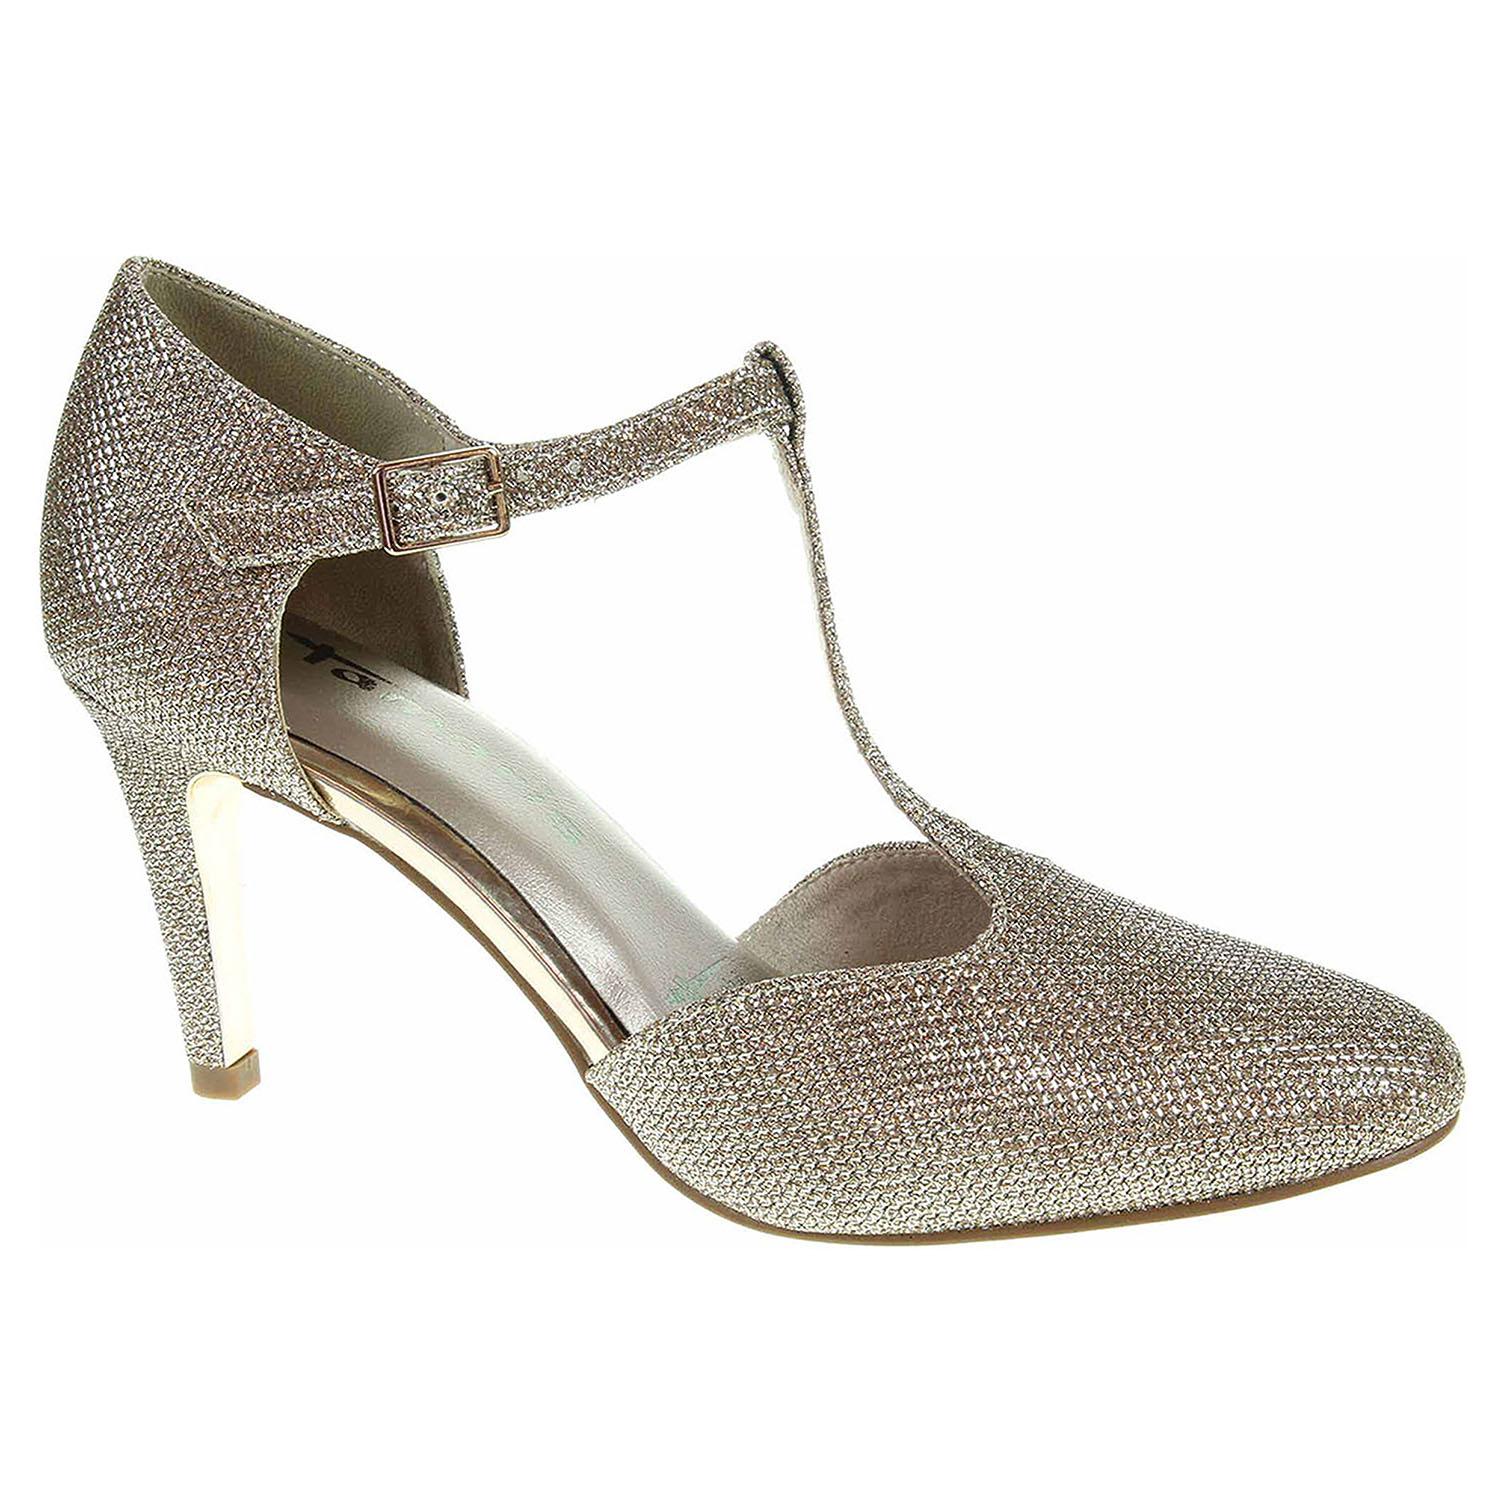 b59e5a6c1919 detail Dámska spoločenské topánky Tamaris 1-24438-39 zlaté